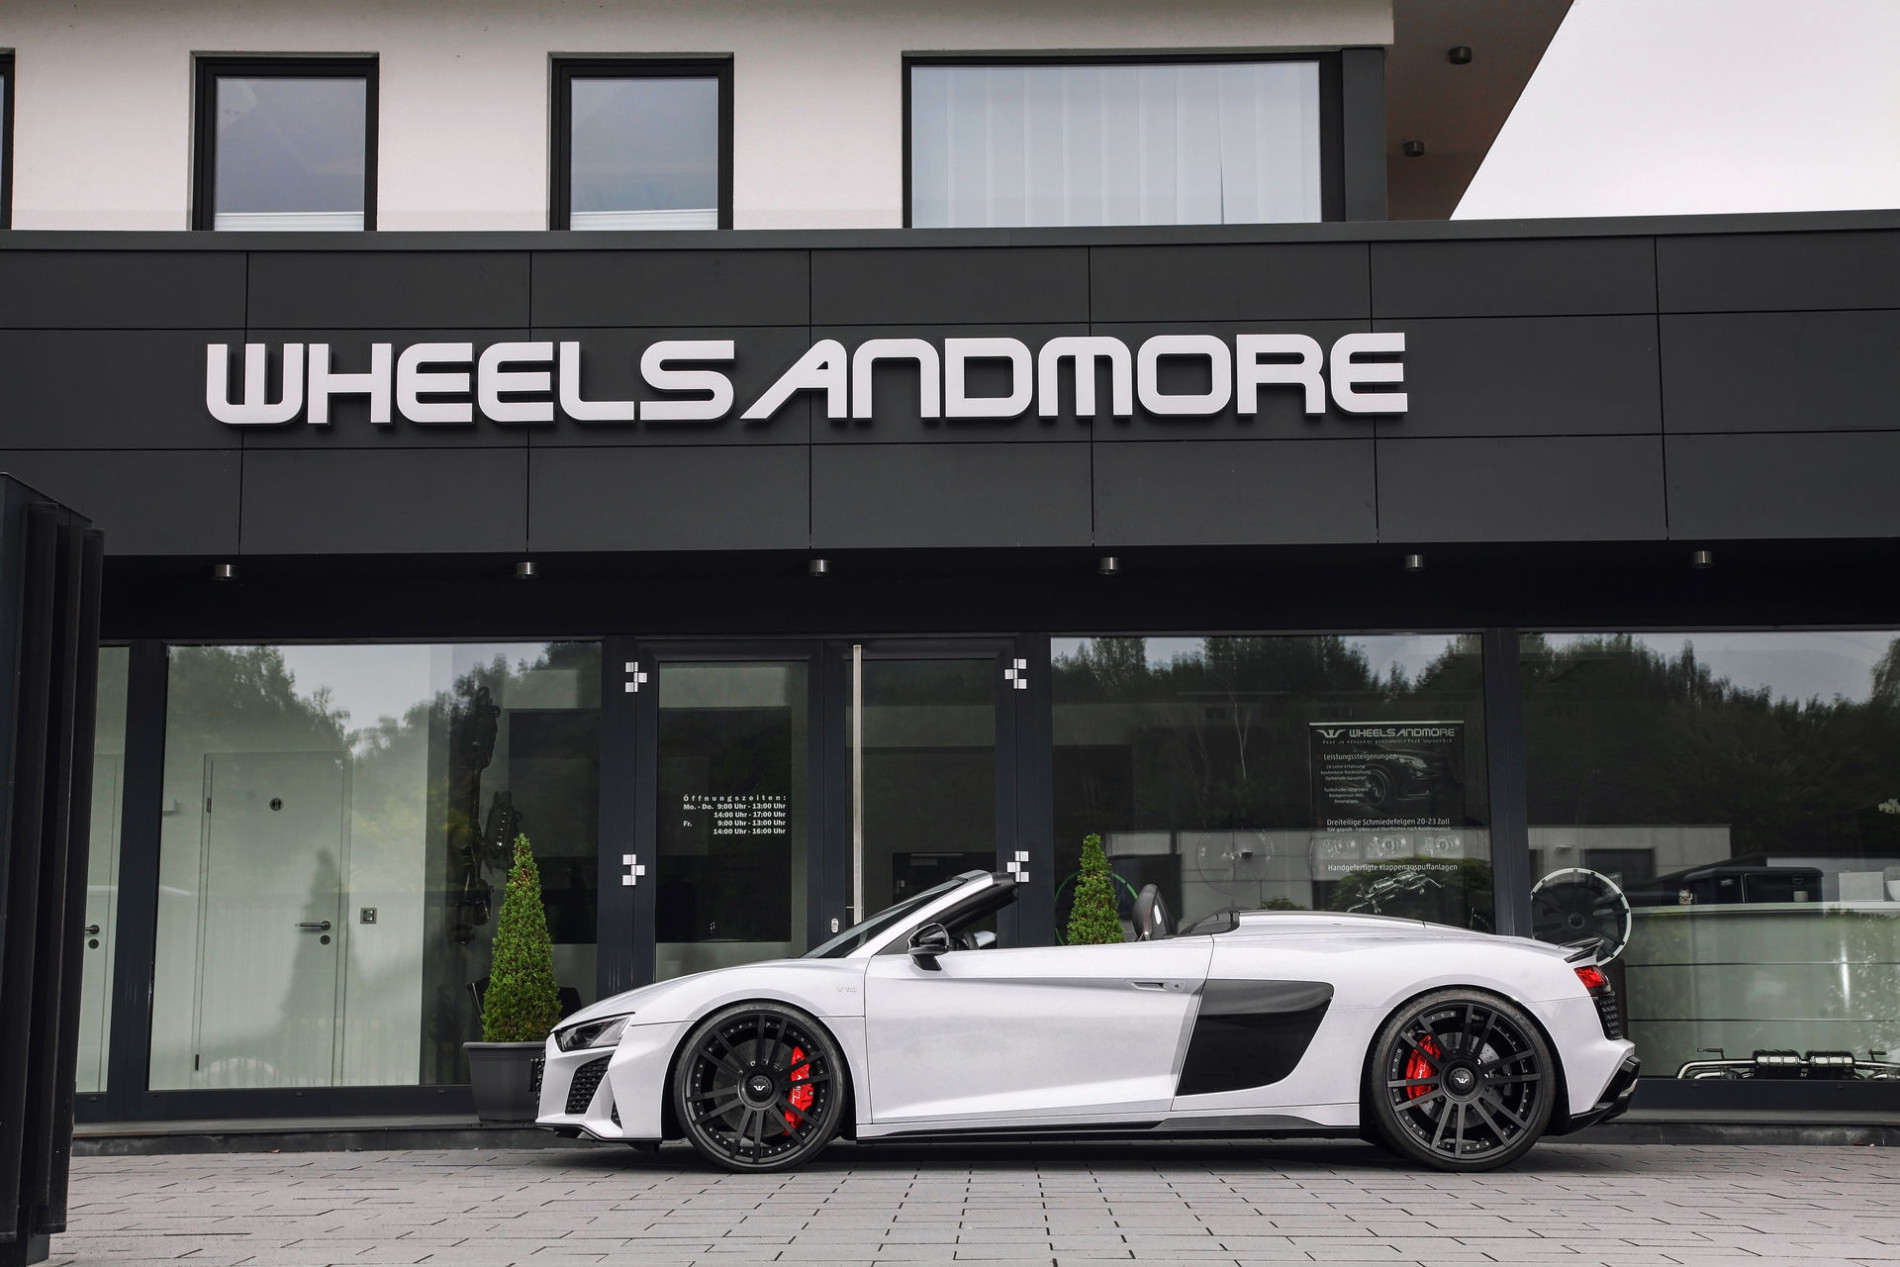 Audi R8 V10 Wheelsandmore - Audi R8 V10 Wheelsandmore